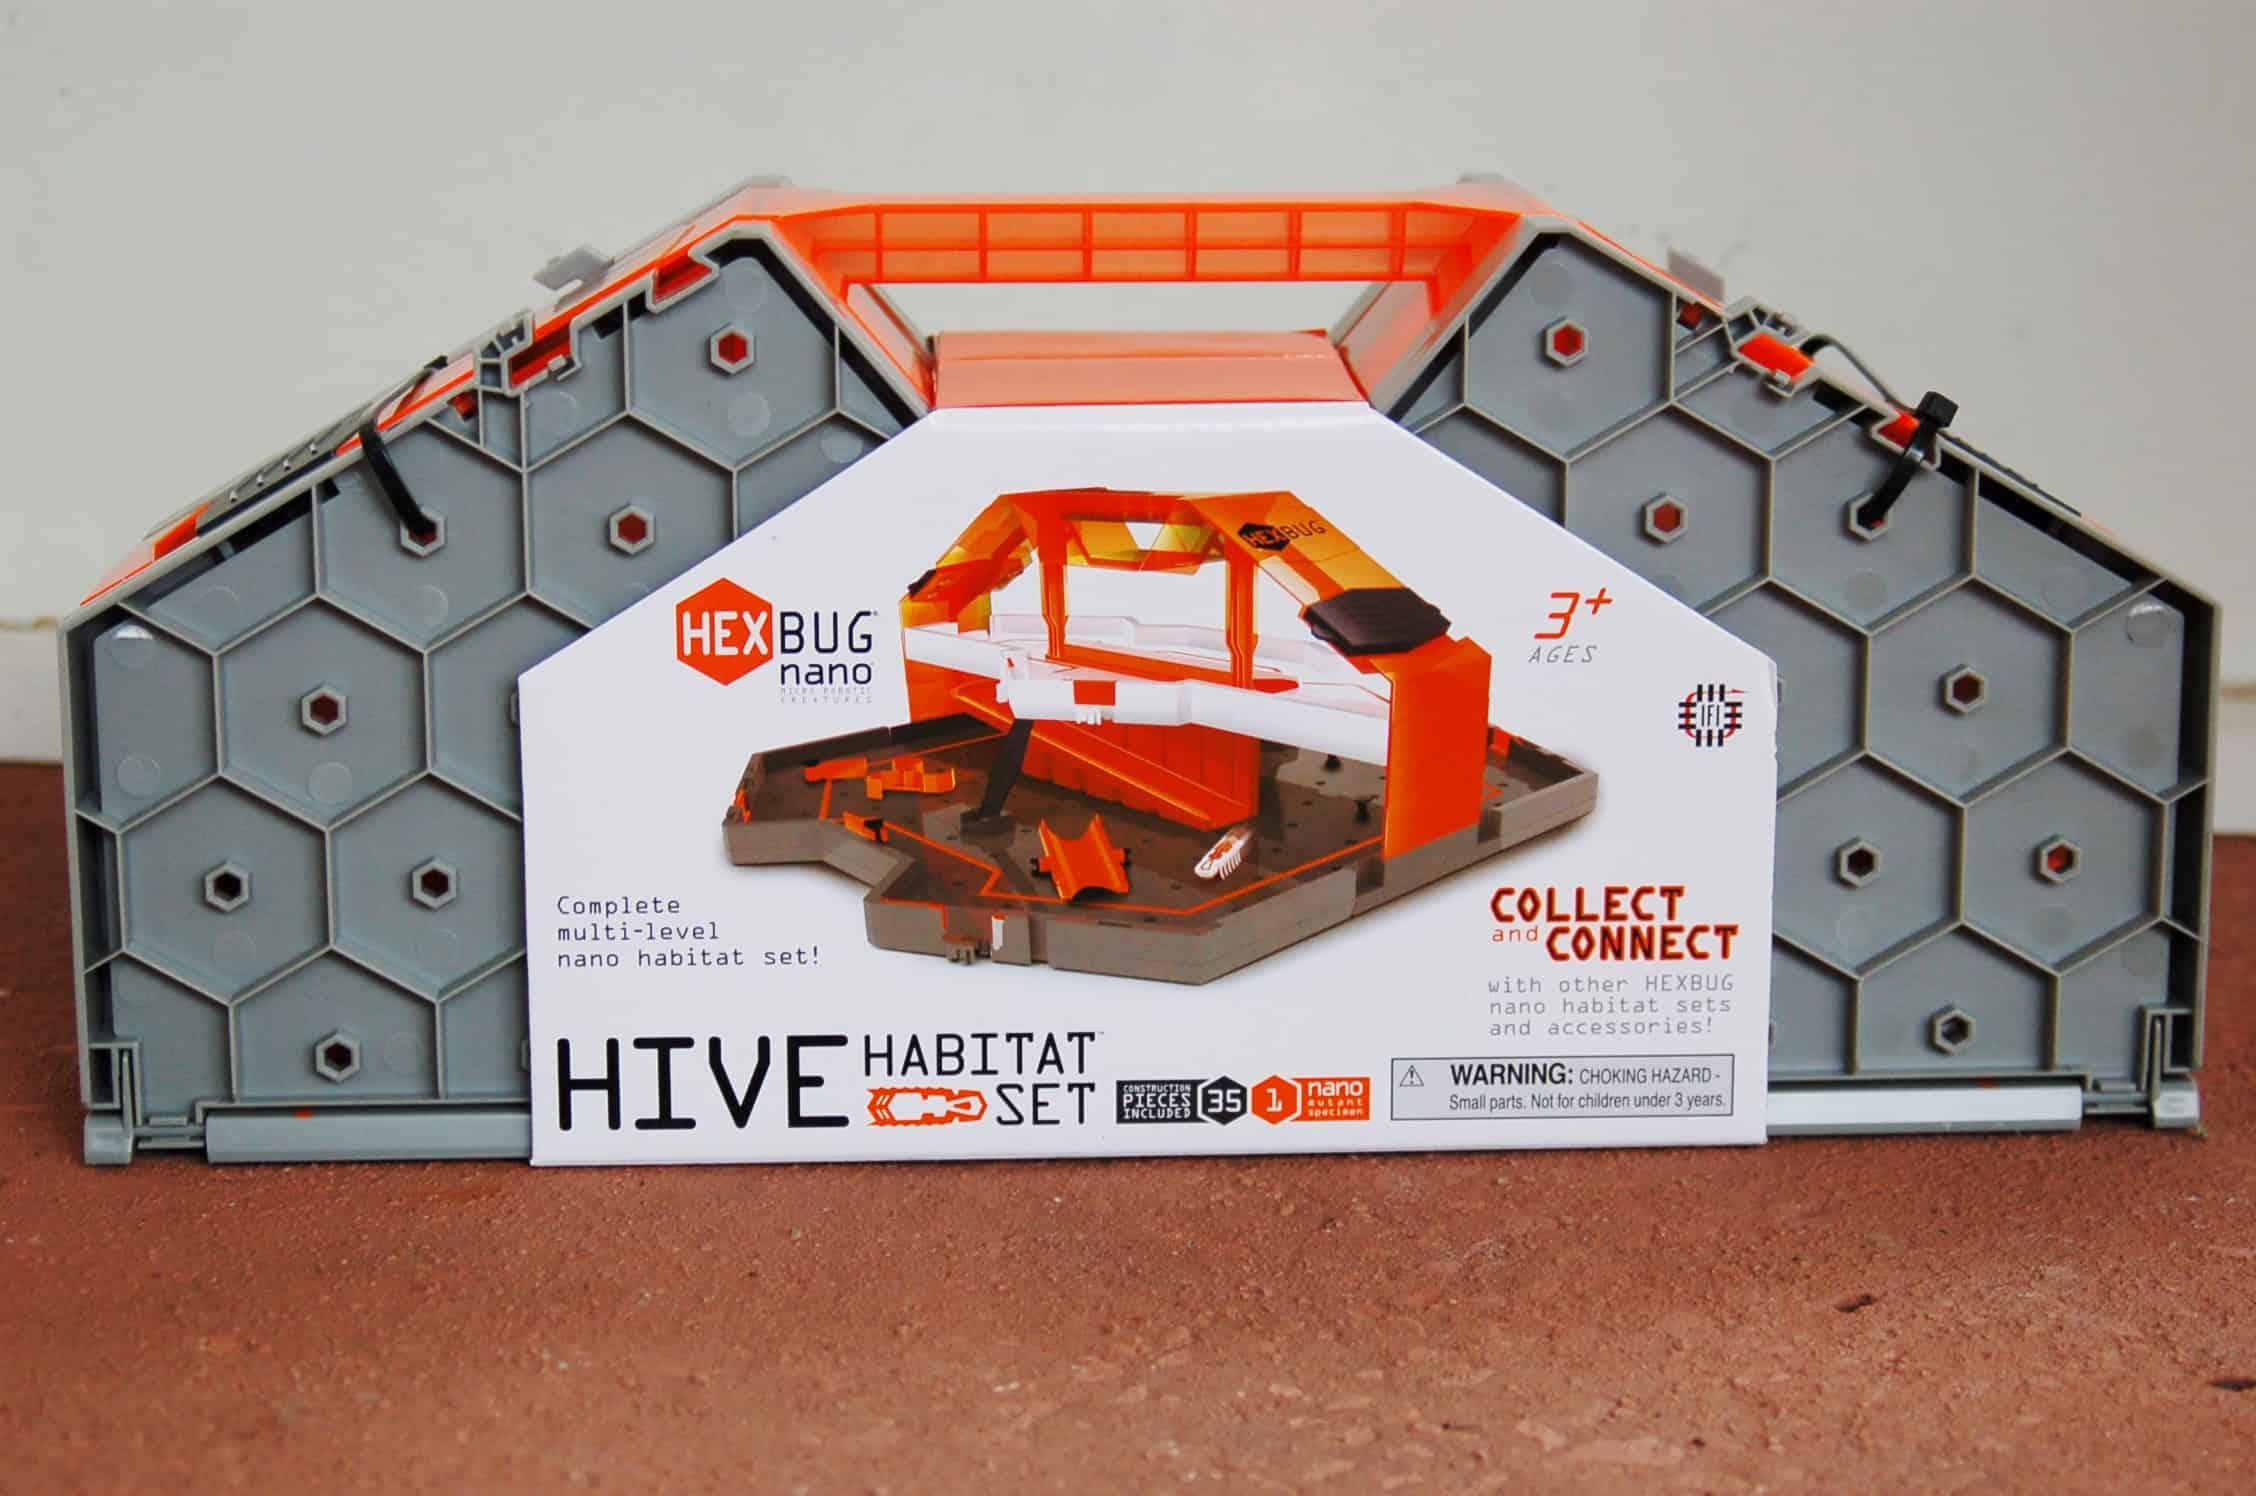 Hexbug Habitat Review Hexbug Hive Habitat Set as